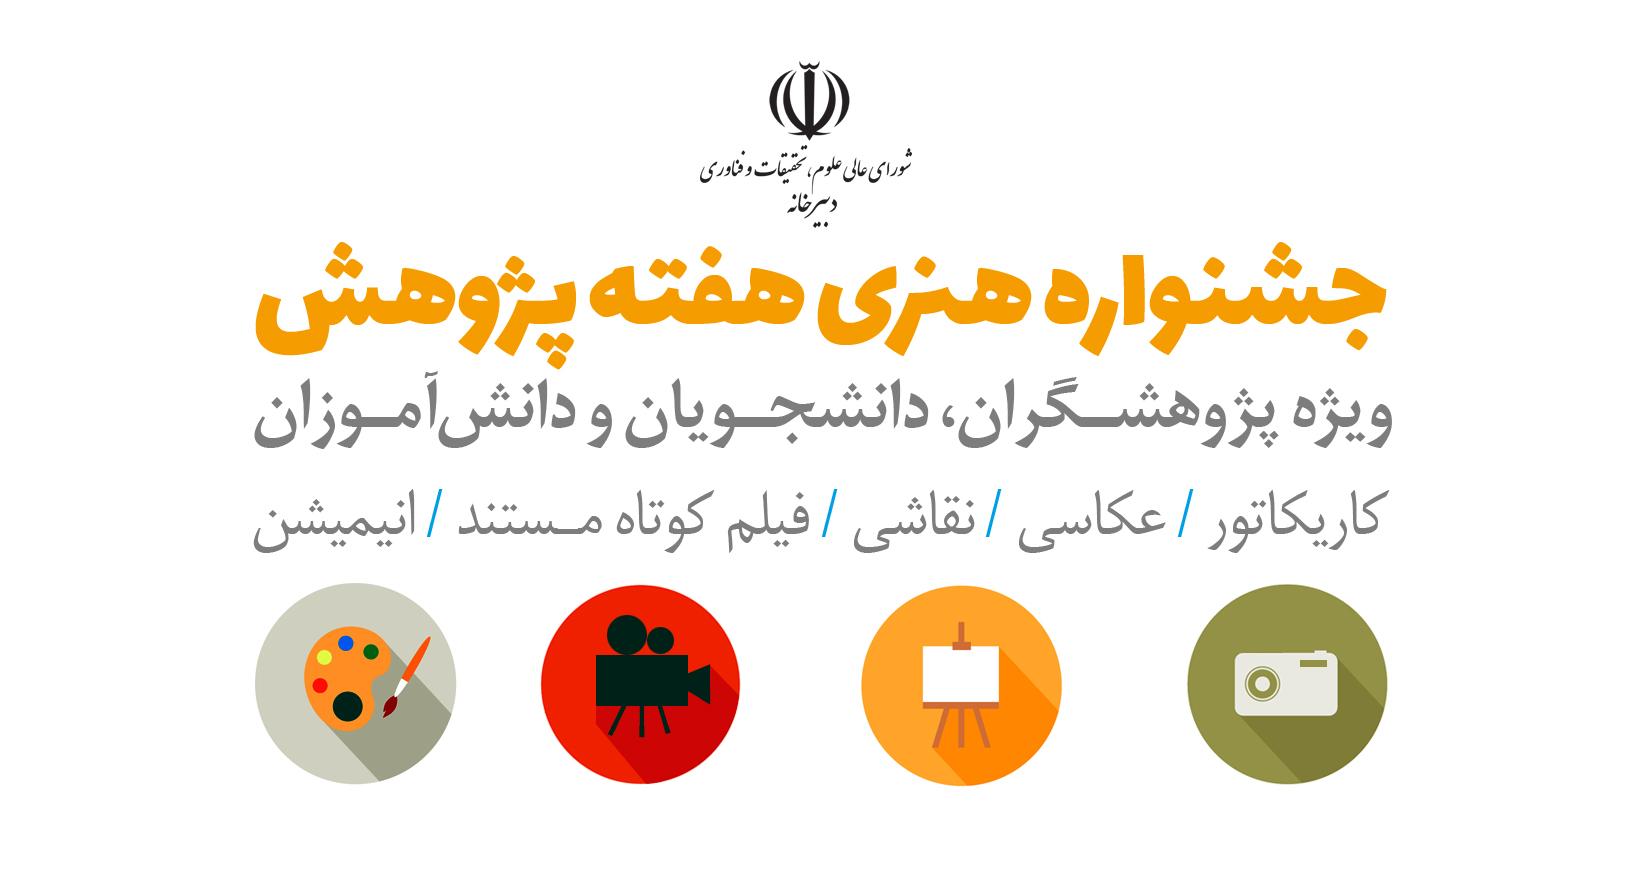 فراخوان جشنواره هنری هفته پژوهش